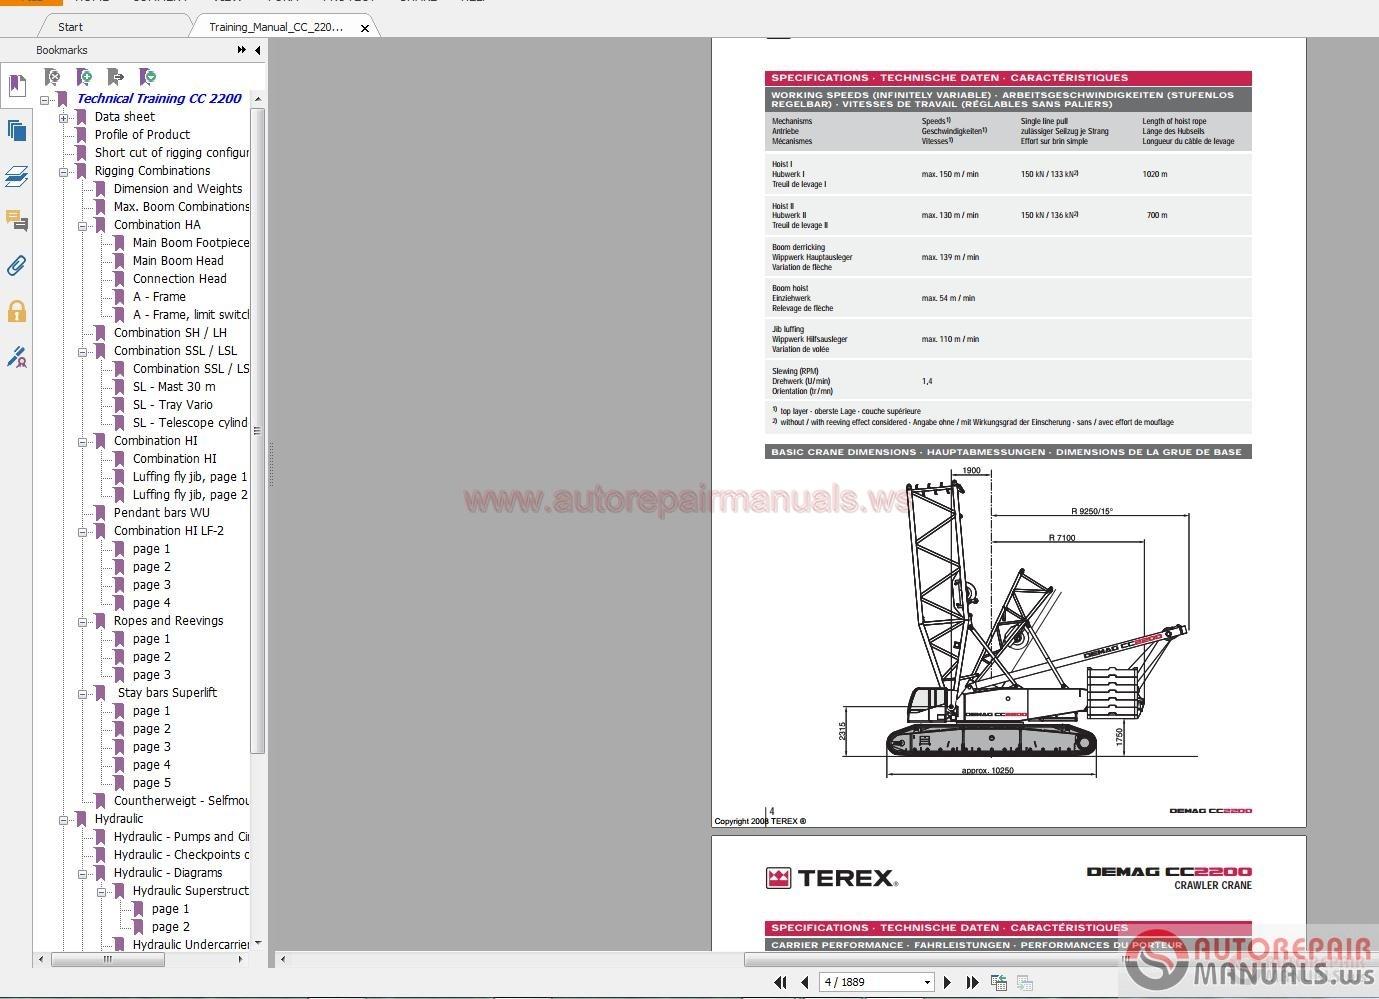 terex demag cc2200 350t training manual auto repair. Black Bedroom Furniture Sets. Home Design Ideas